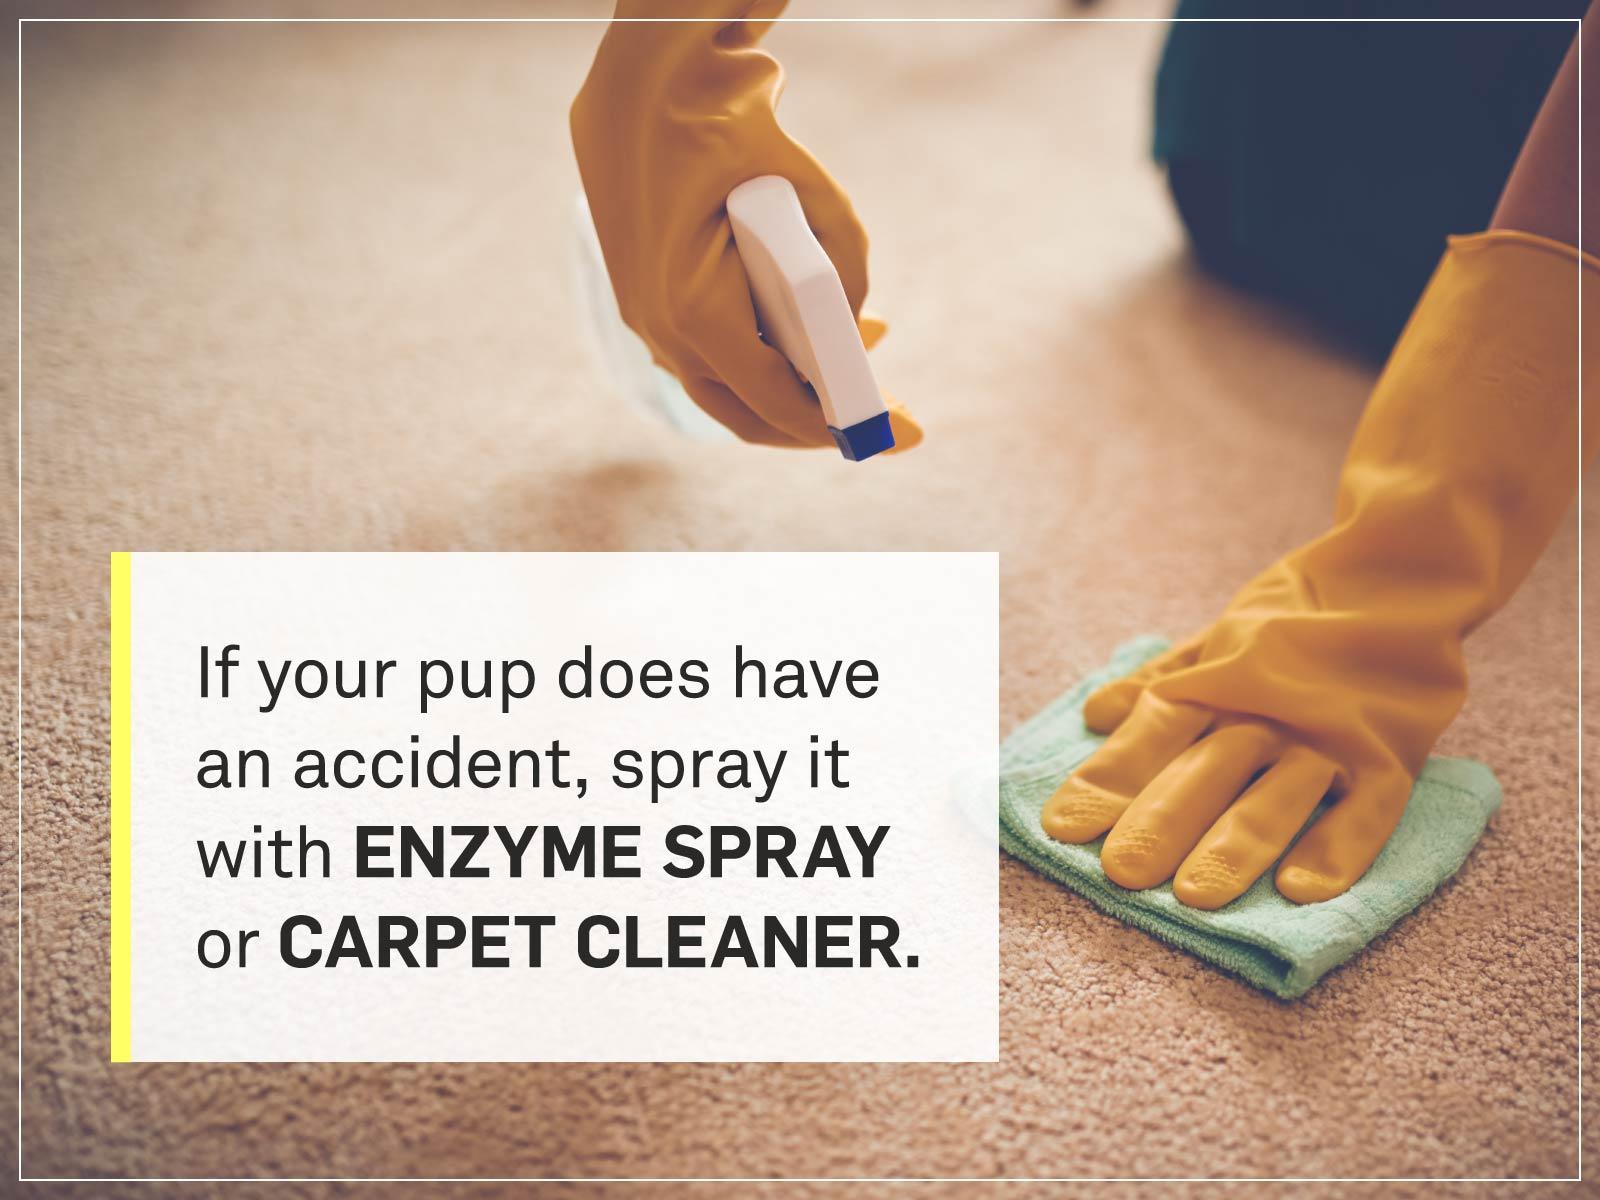 new puppy checklist 8-cleaning-carpet